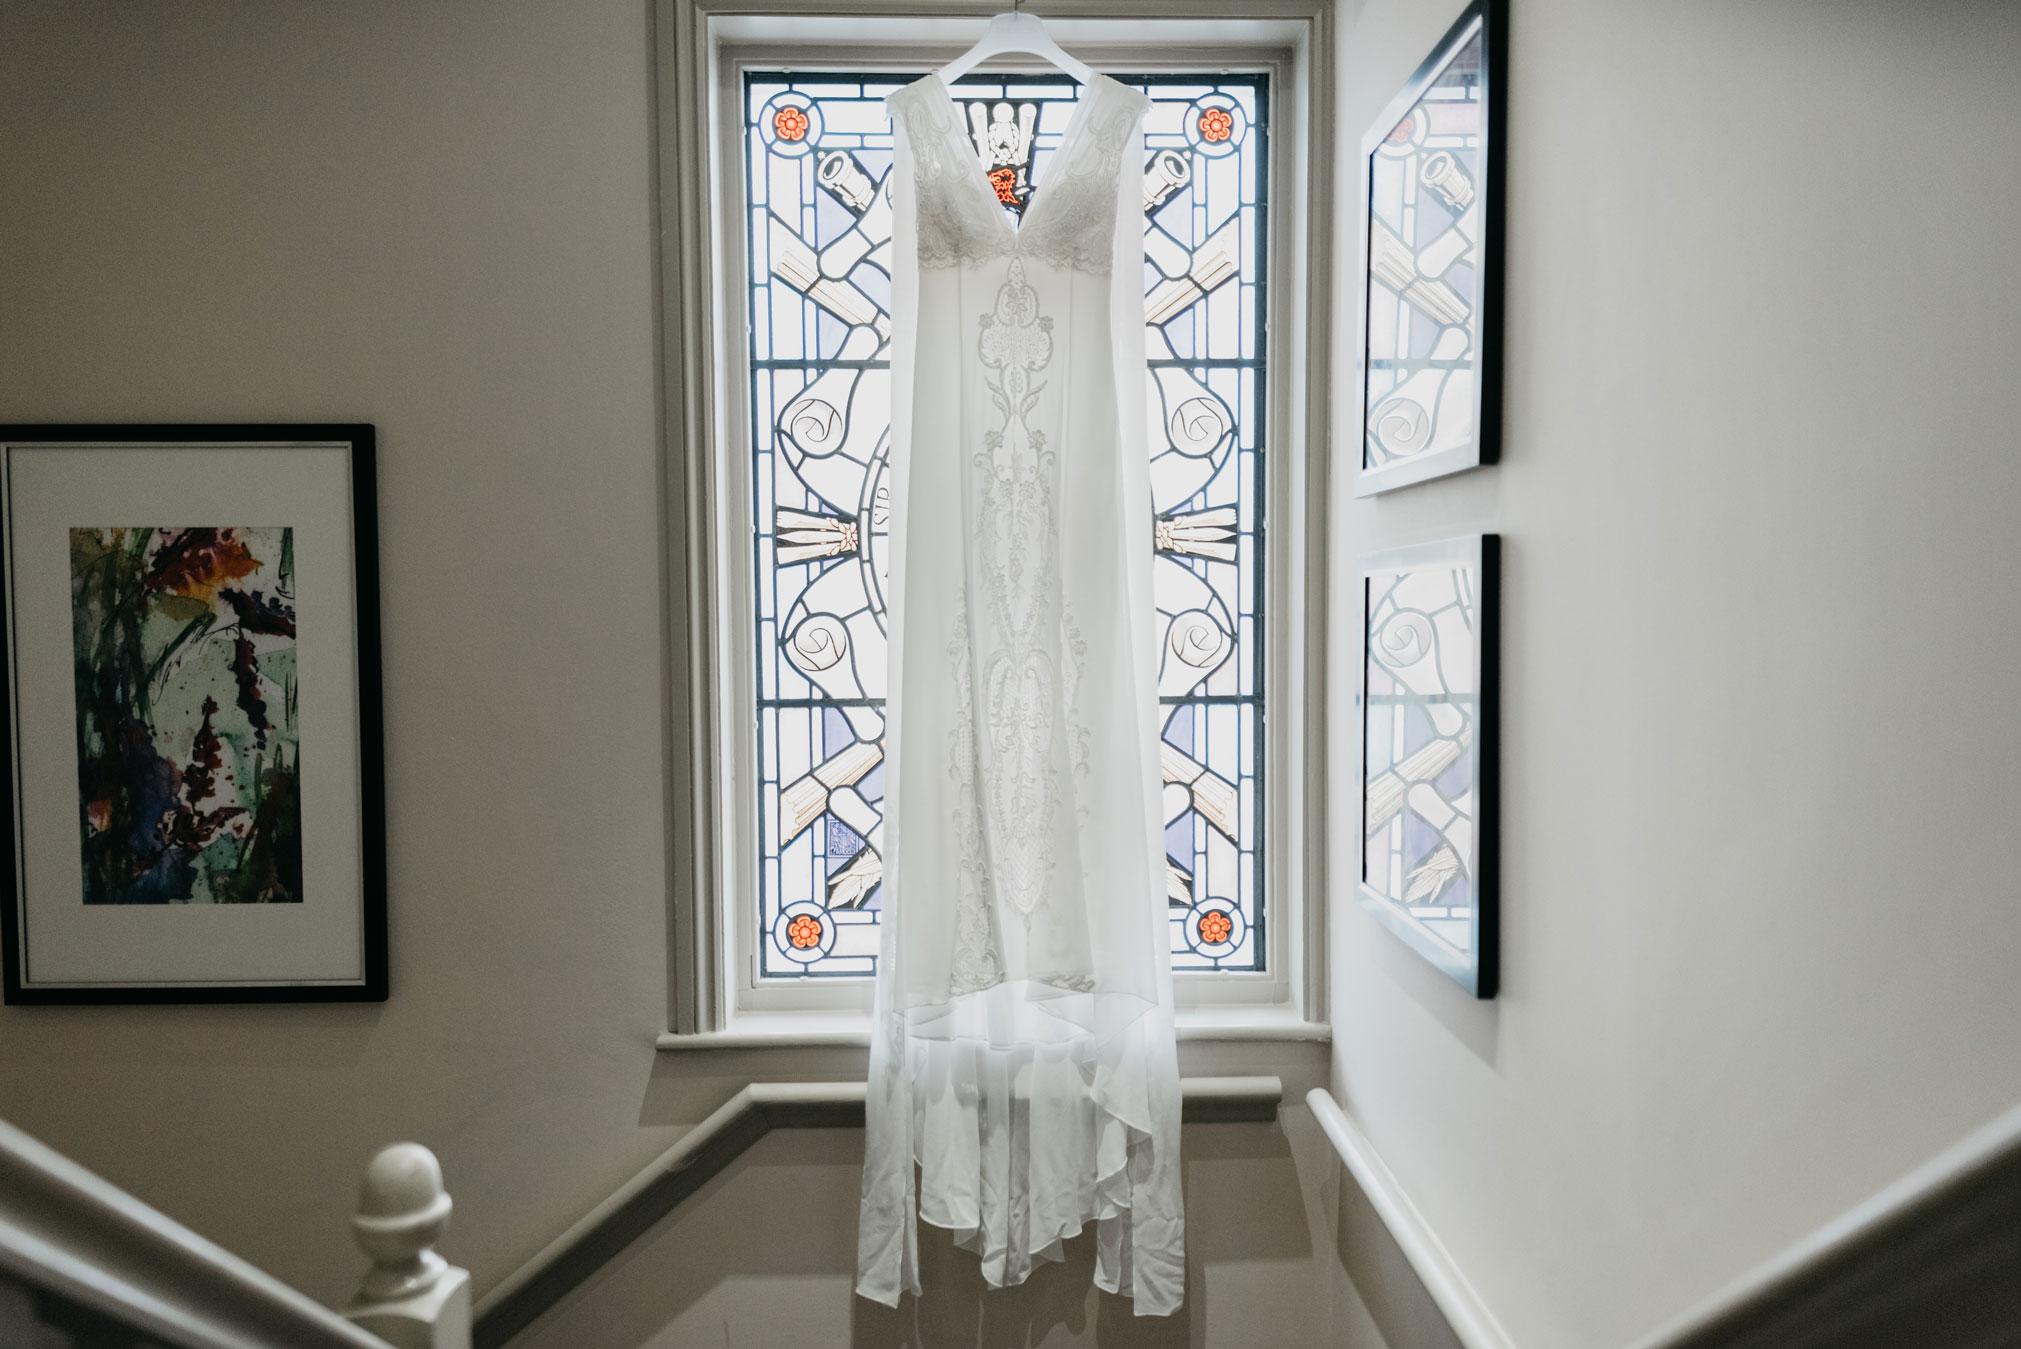 brides dress hung up at the window